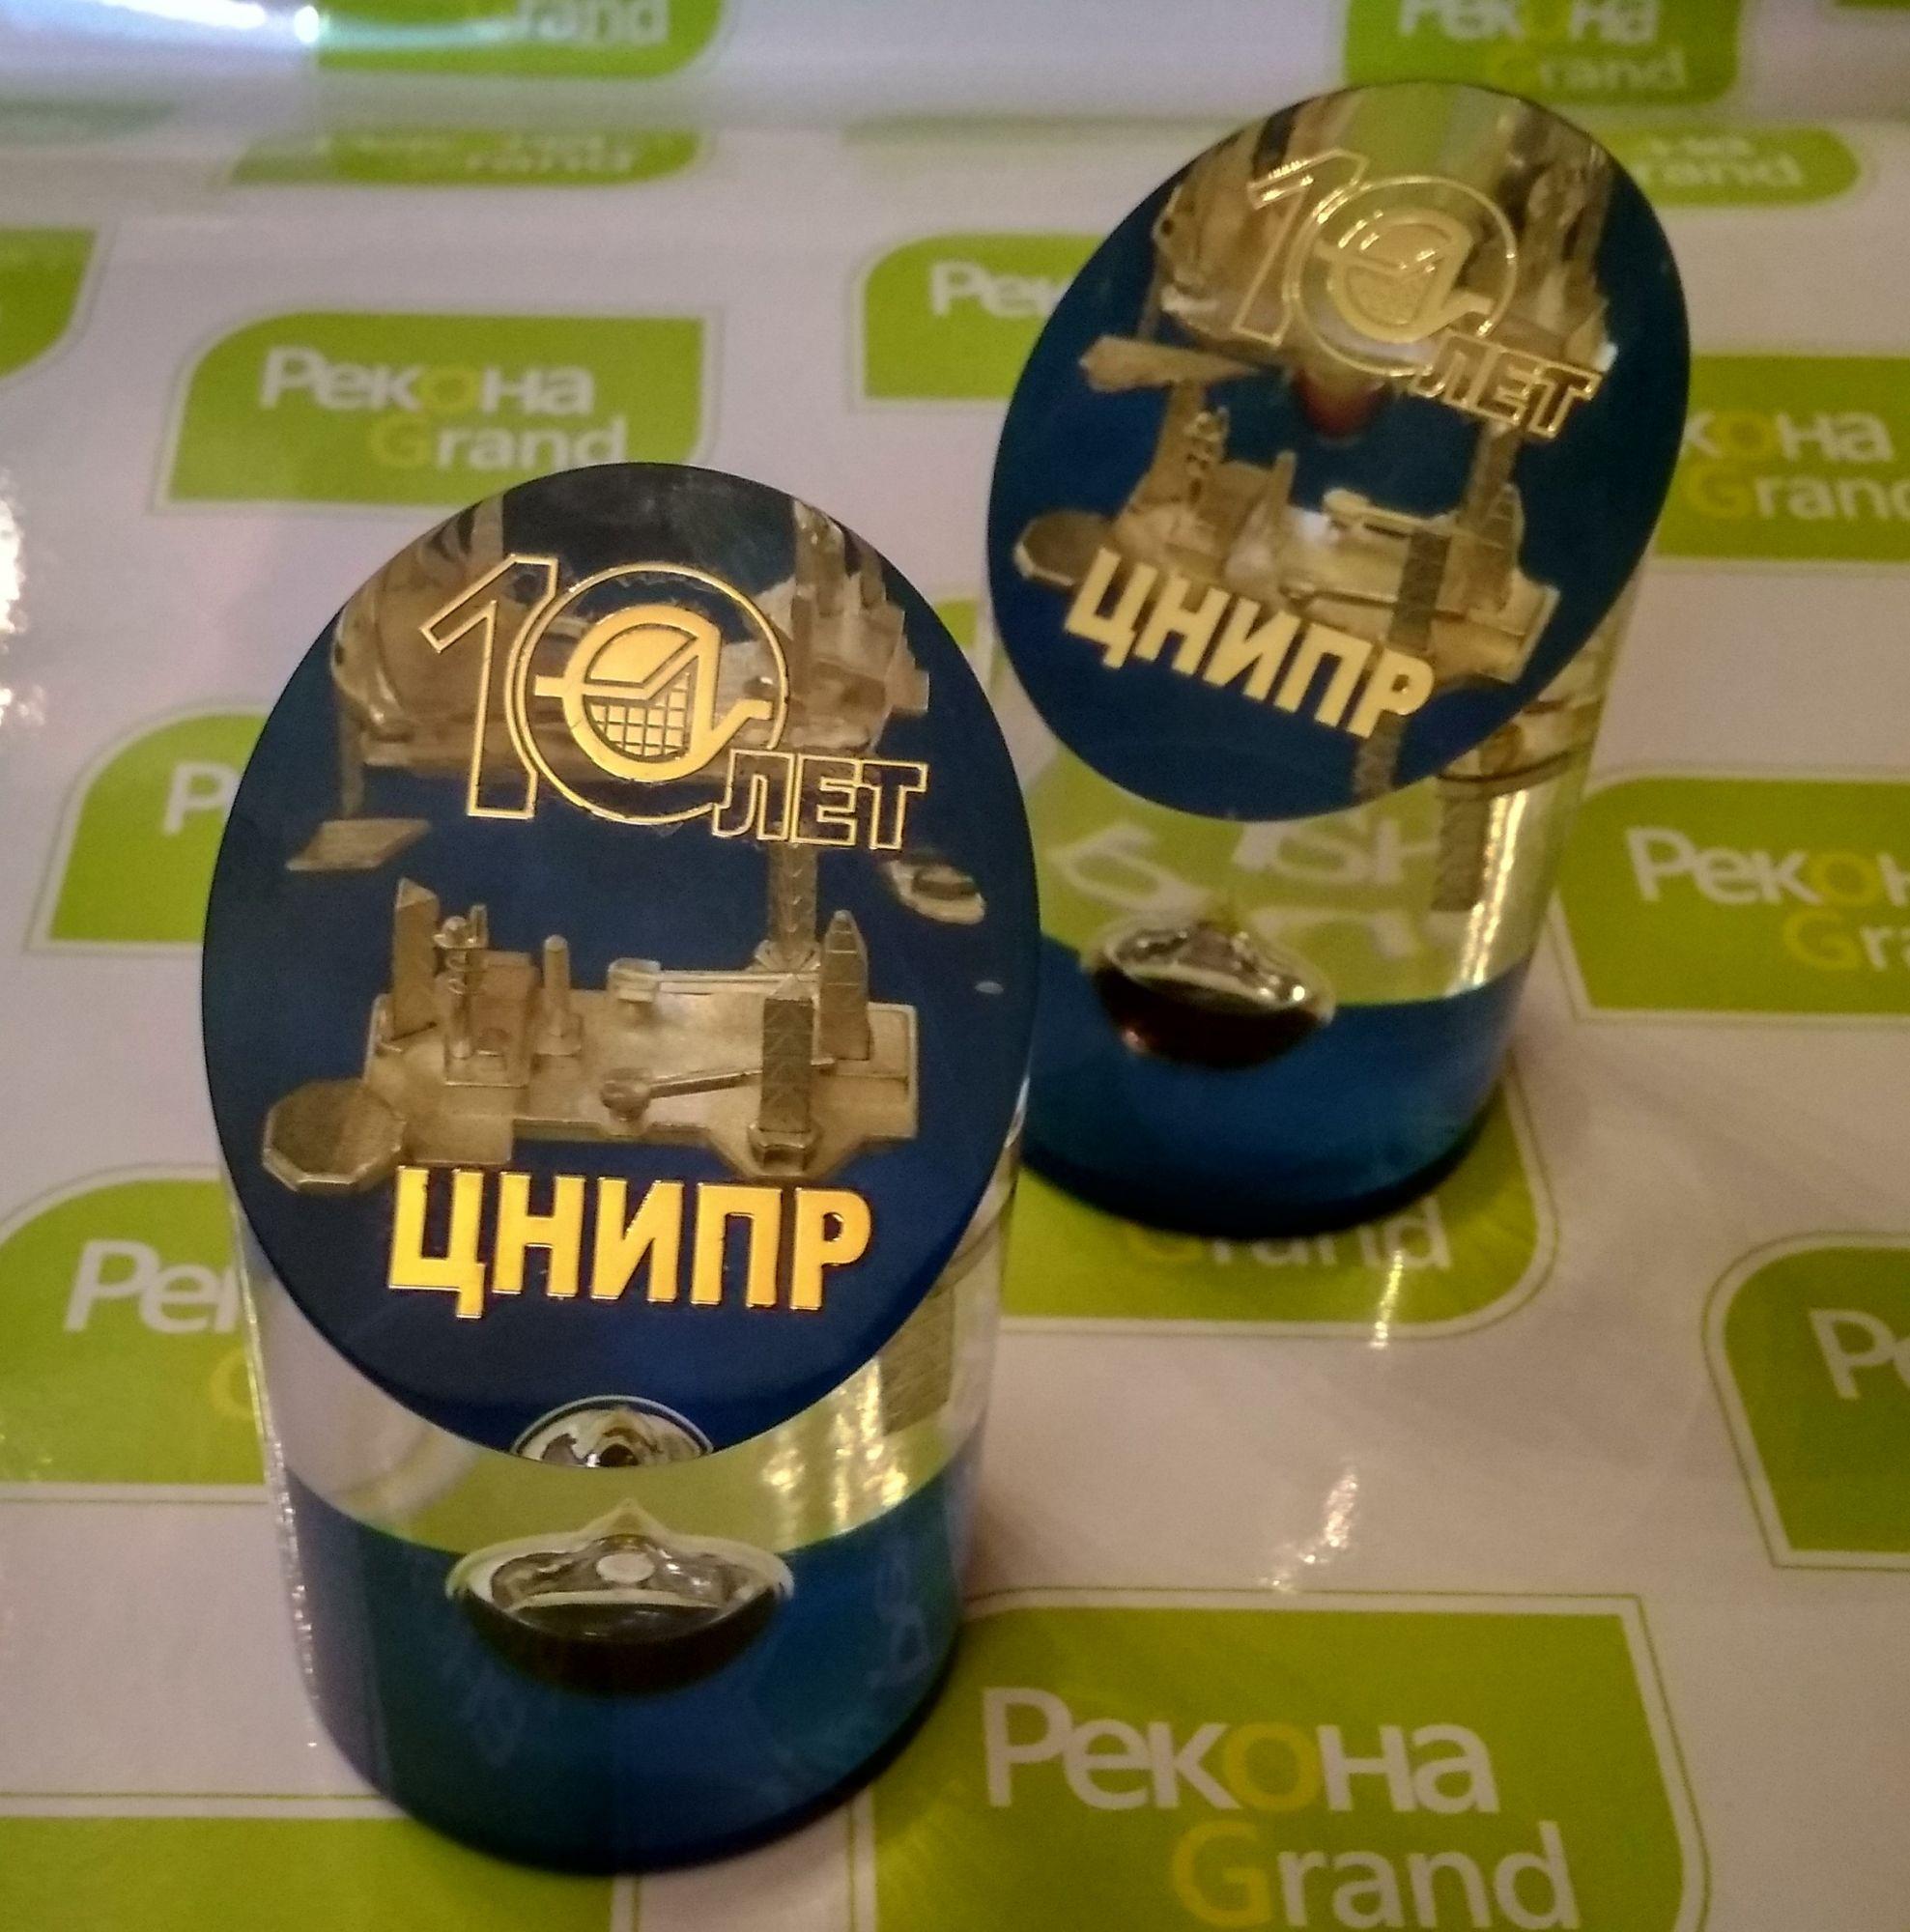 корпоративные сувениры с логотипом в Самаре